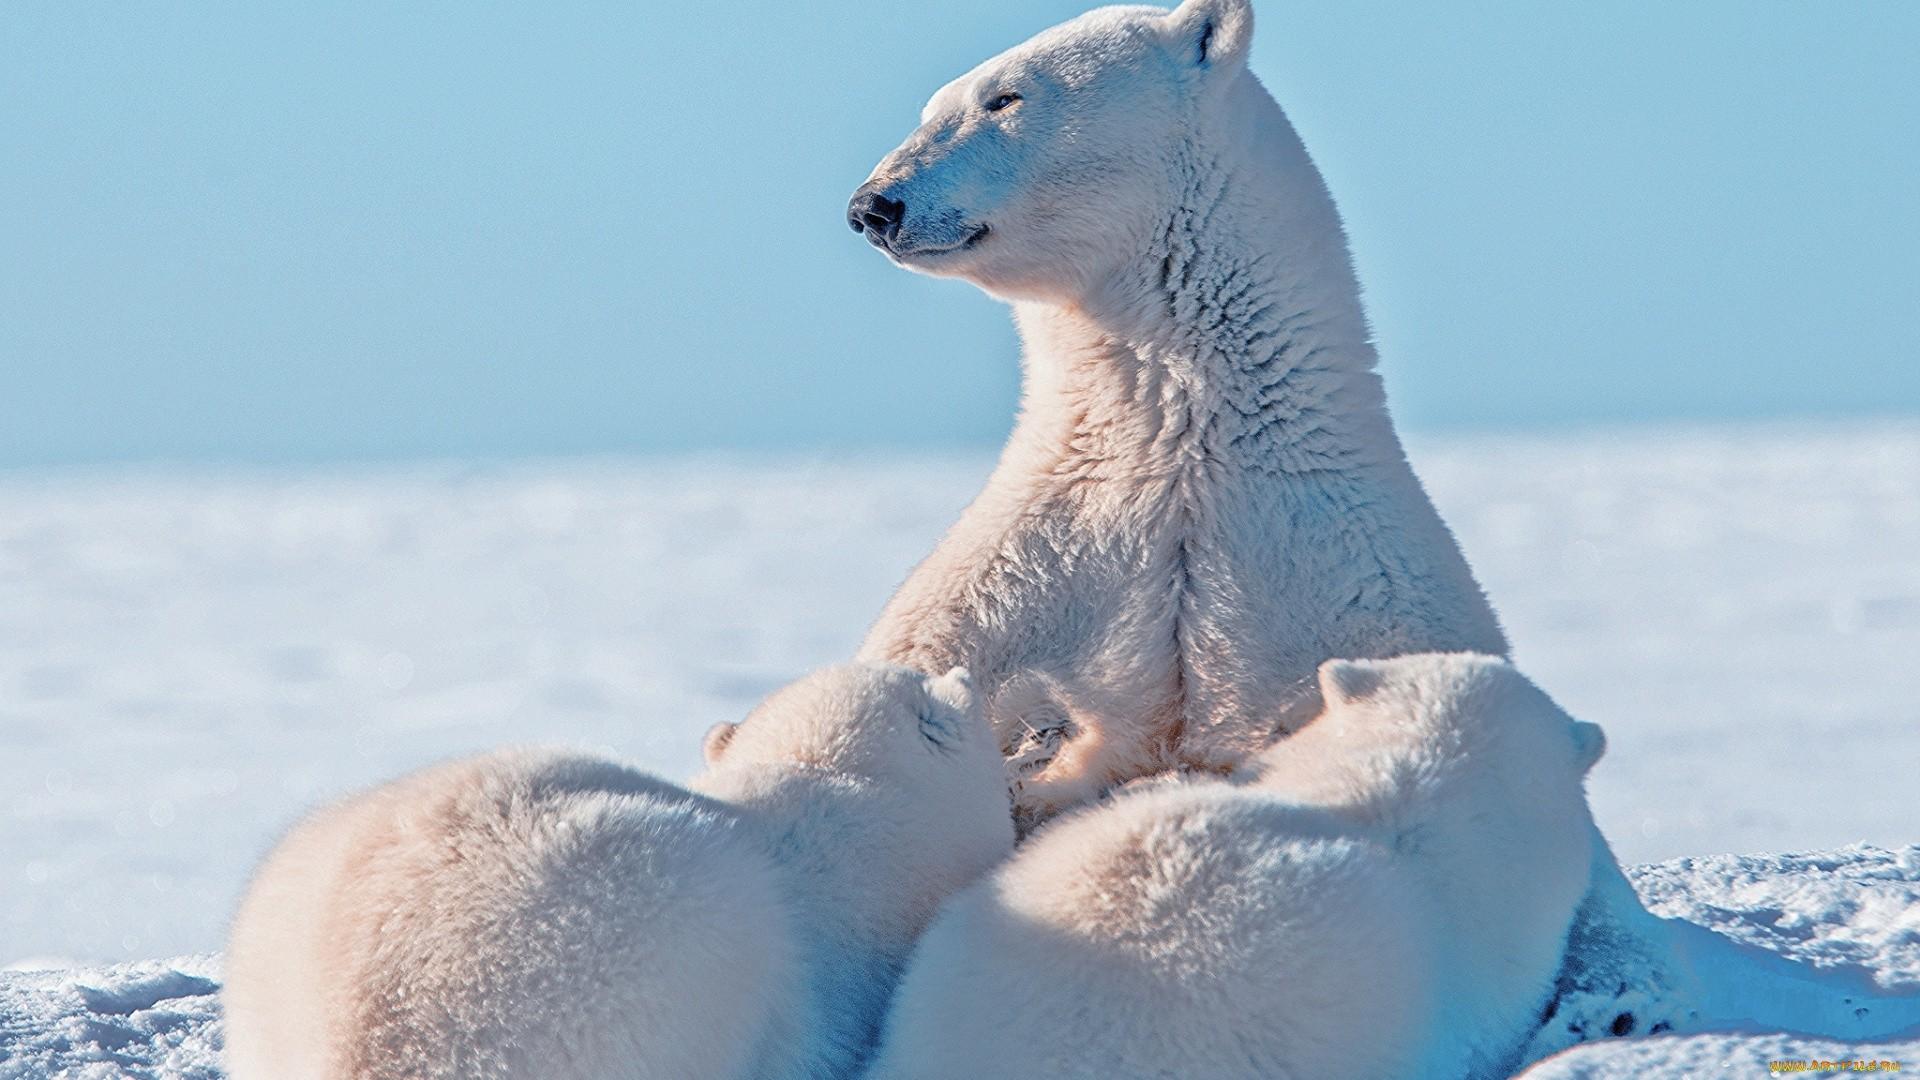 Polar Bear Wallpaper and Background